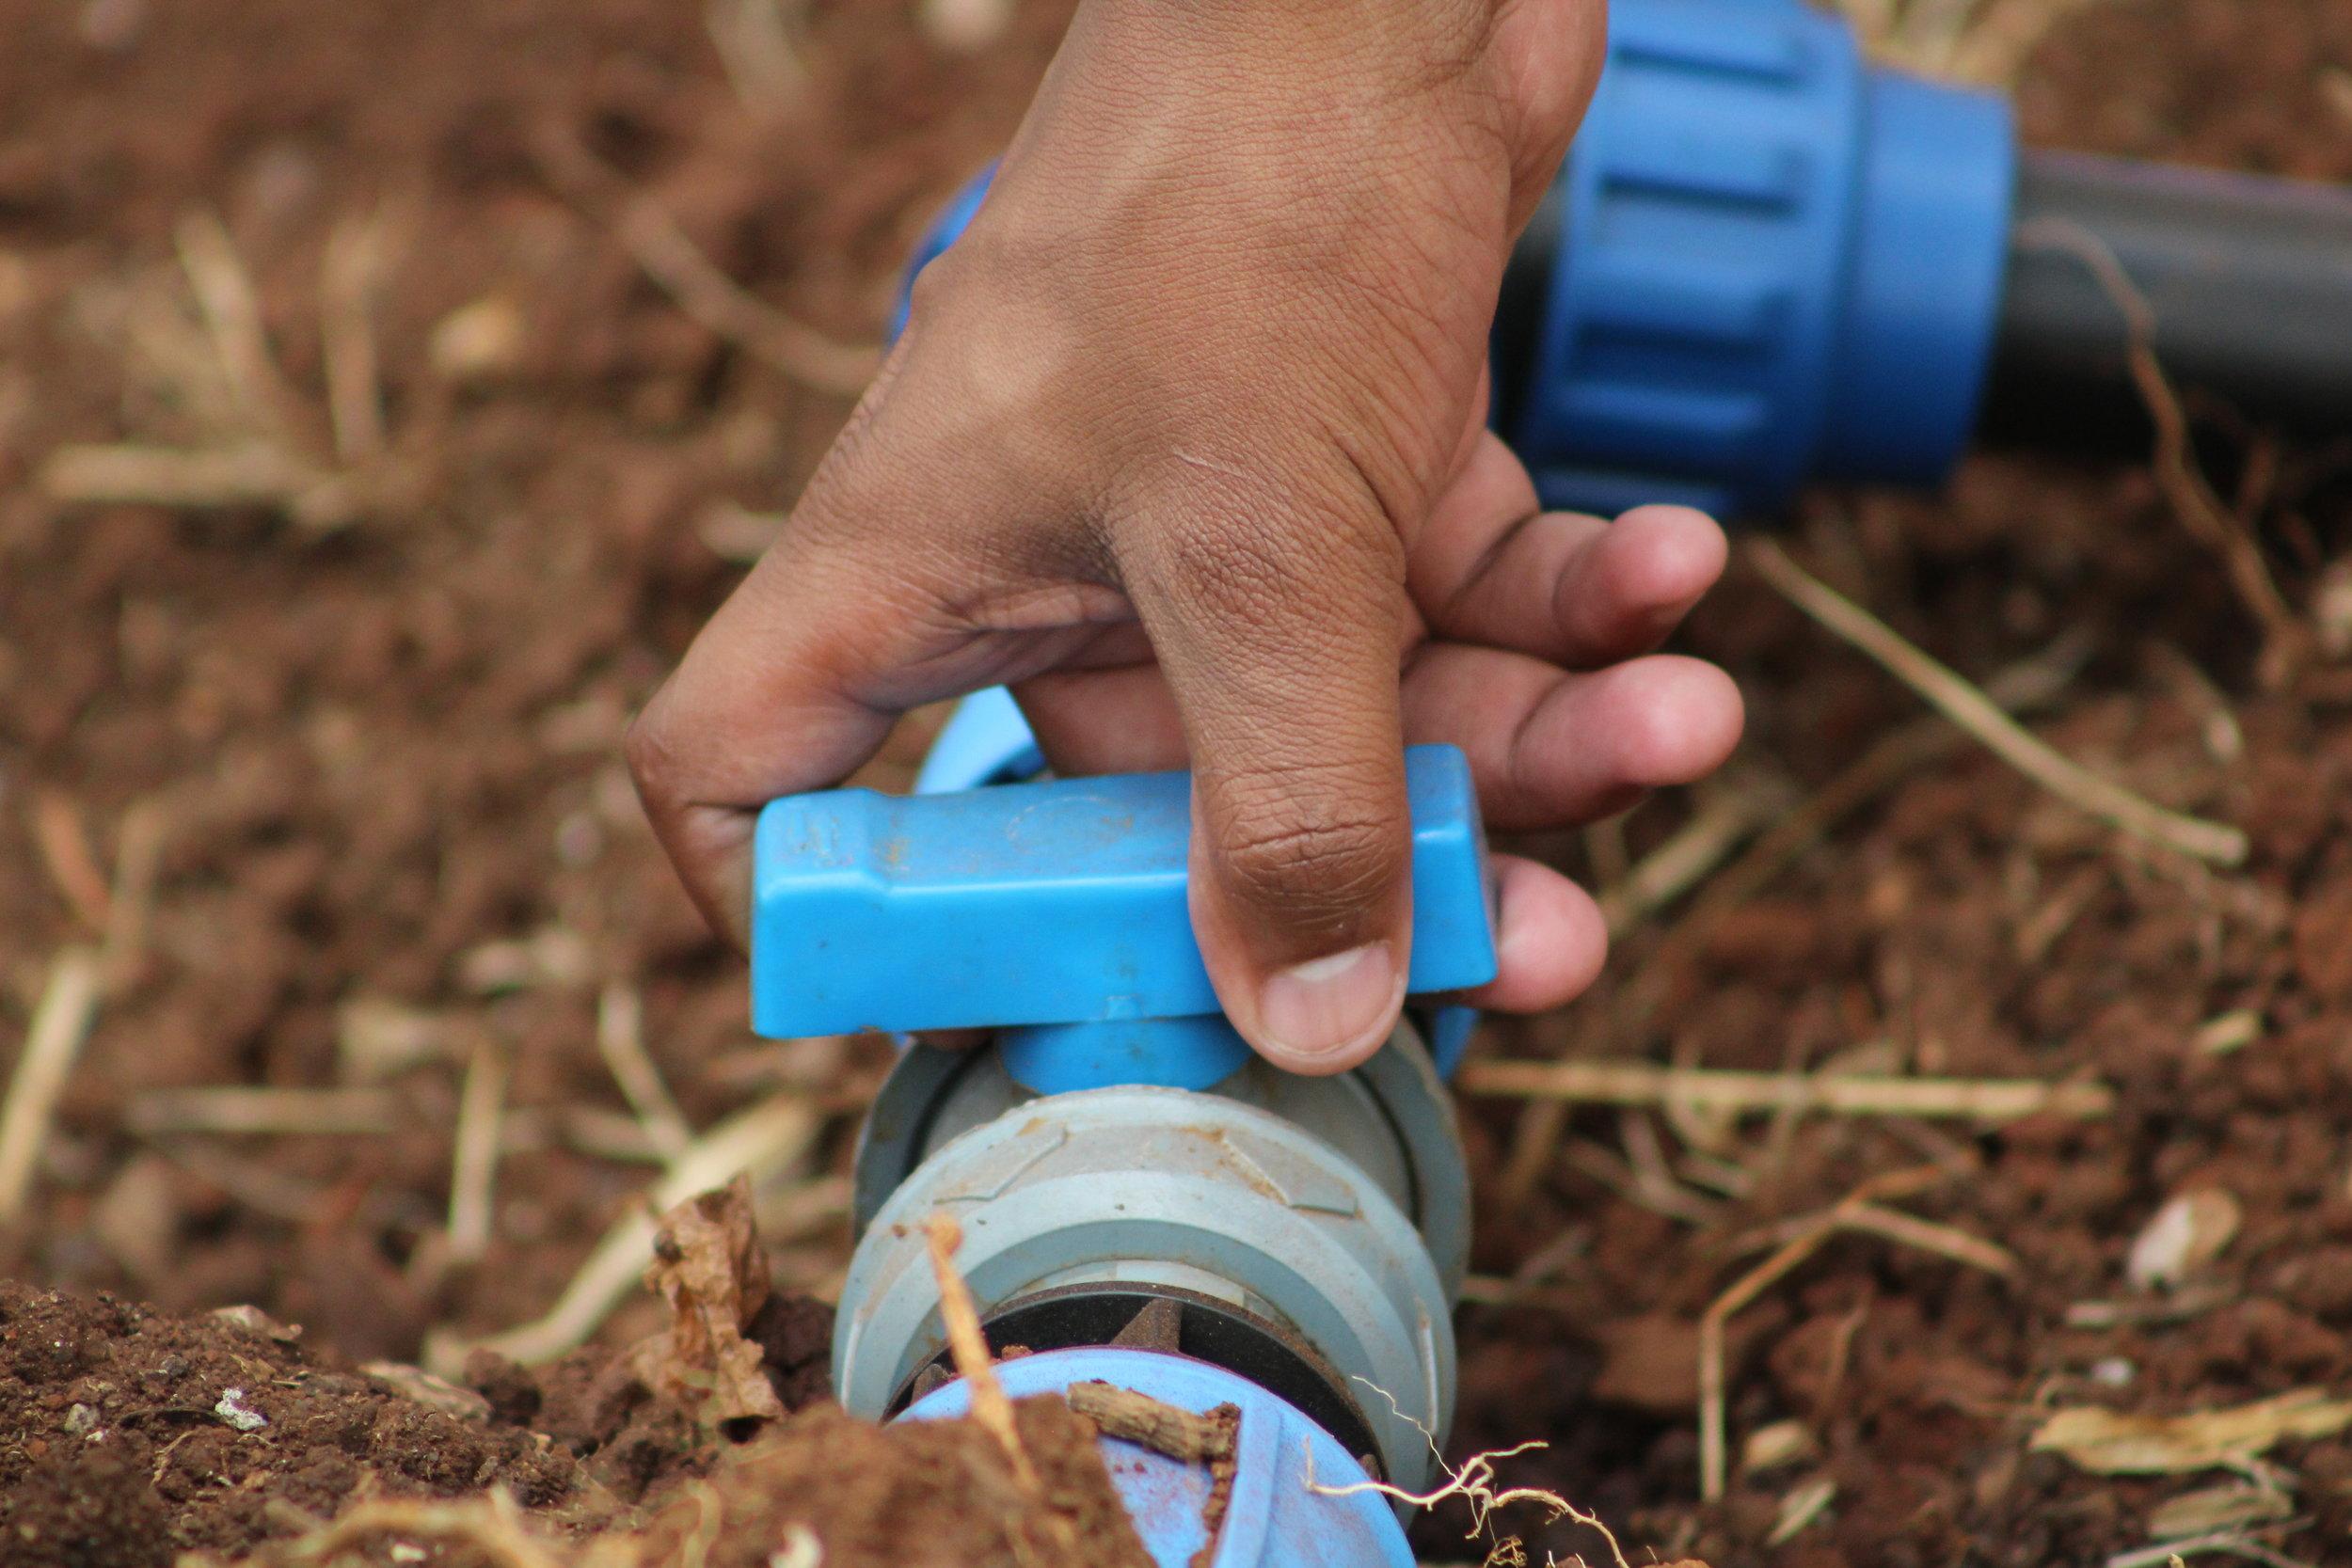 Illuminum Greenhouses technician demonstrates how to open a drip irrigation kit.JPG